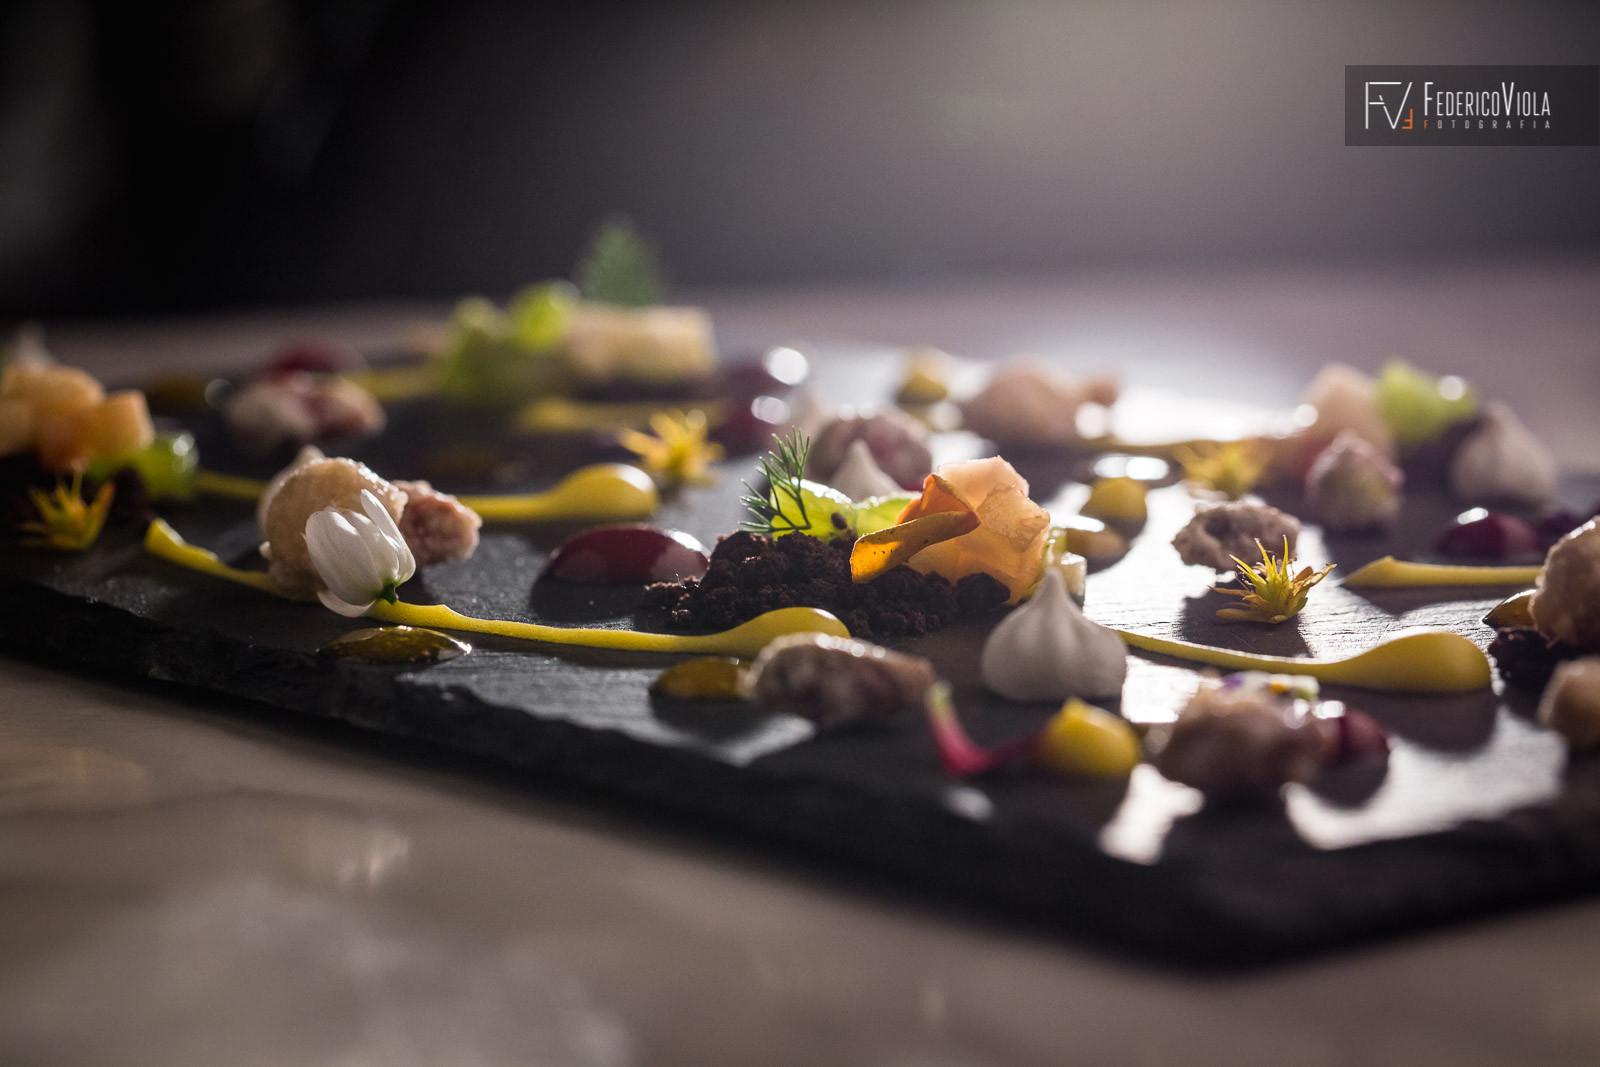 Fotografo-food-Gaeta-Federico-Viola-Cuci